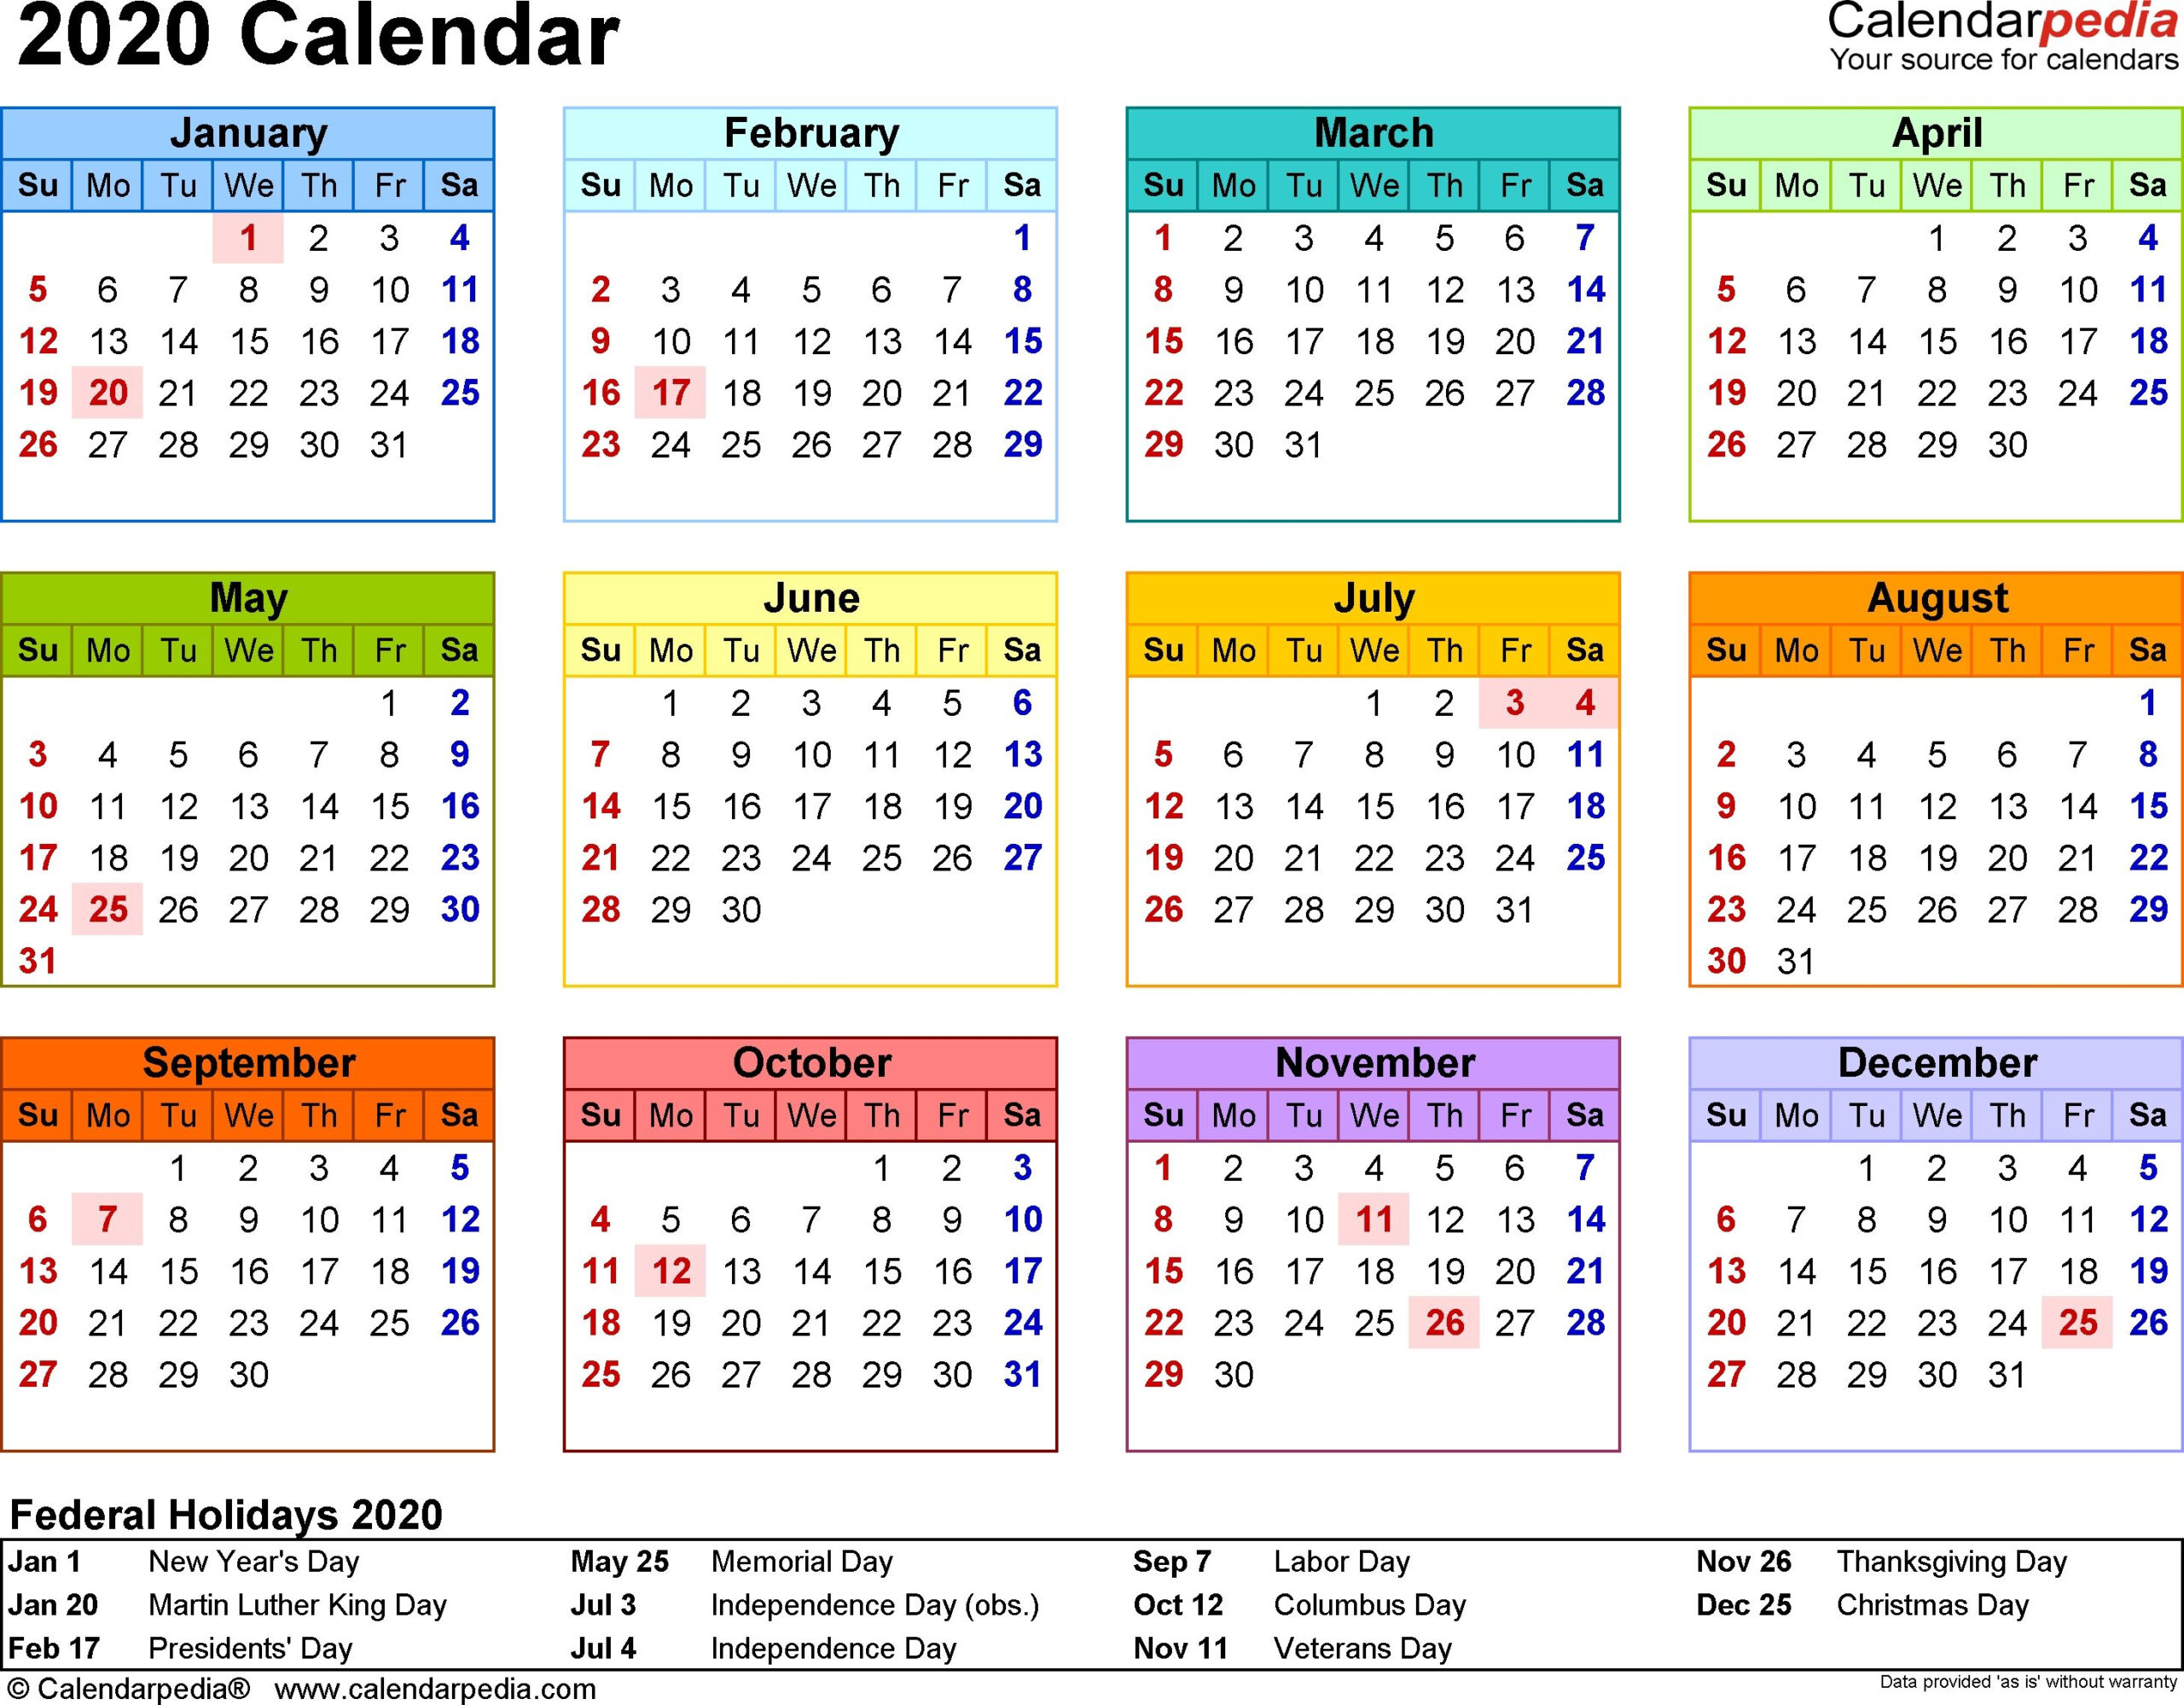 2020 Free Printable Calendar Large Numbers In 2020 inside Large Number Calendar